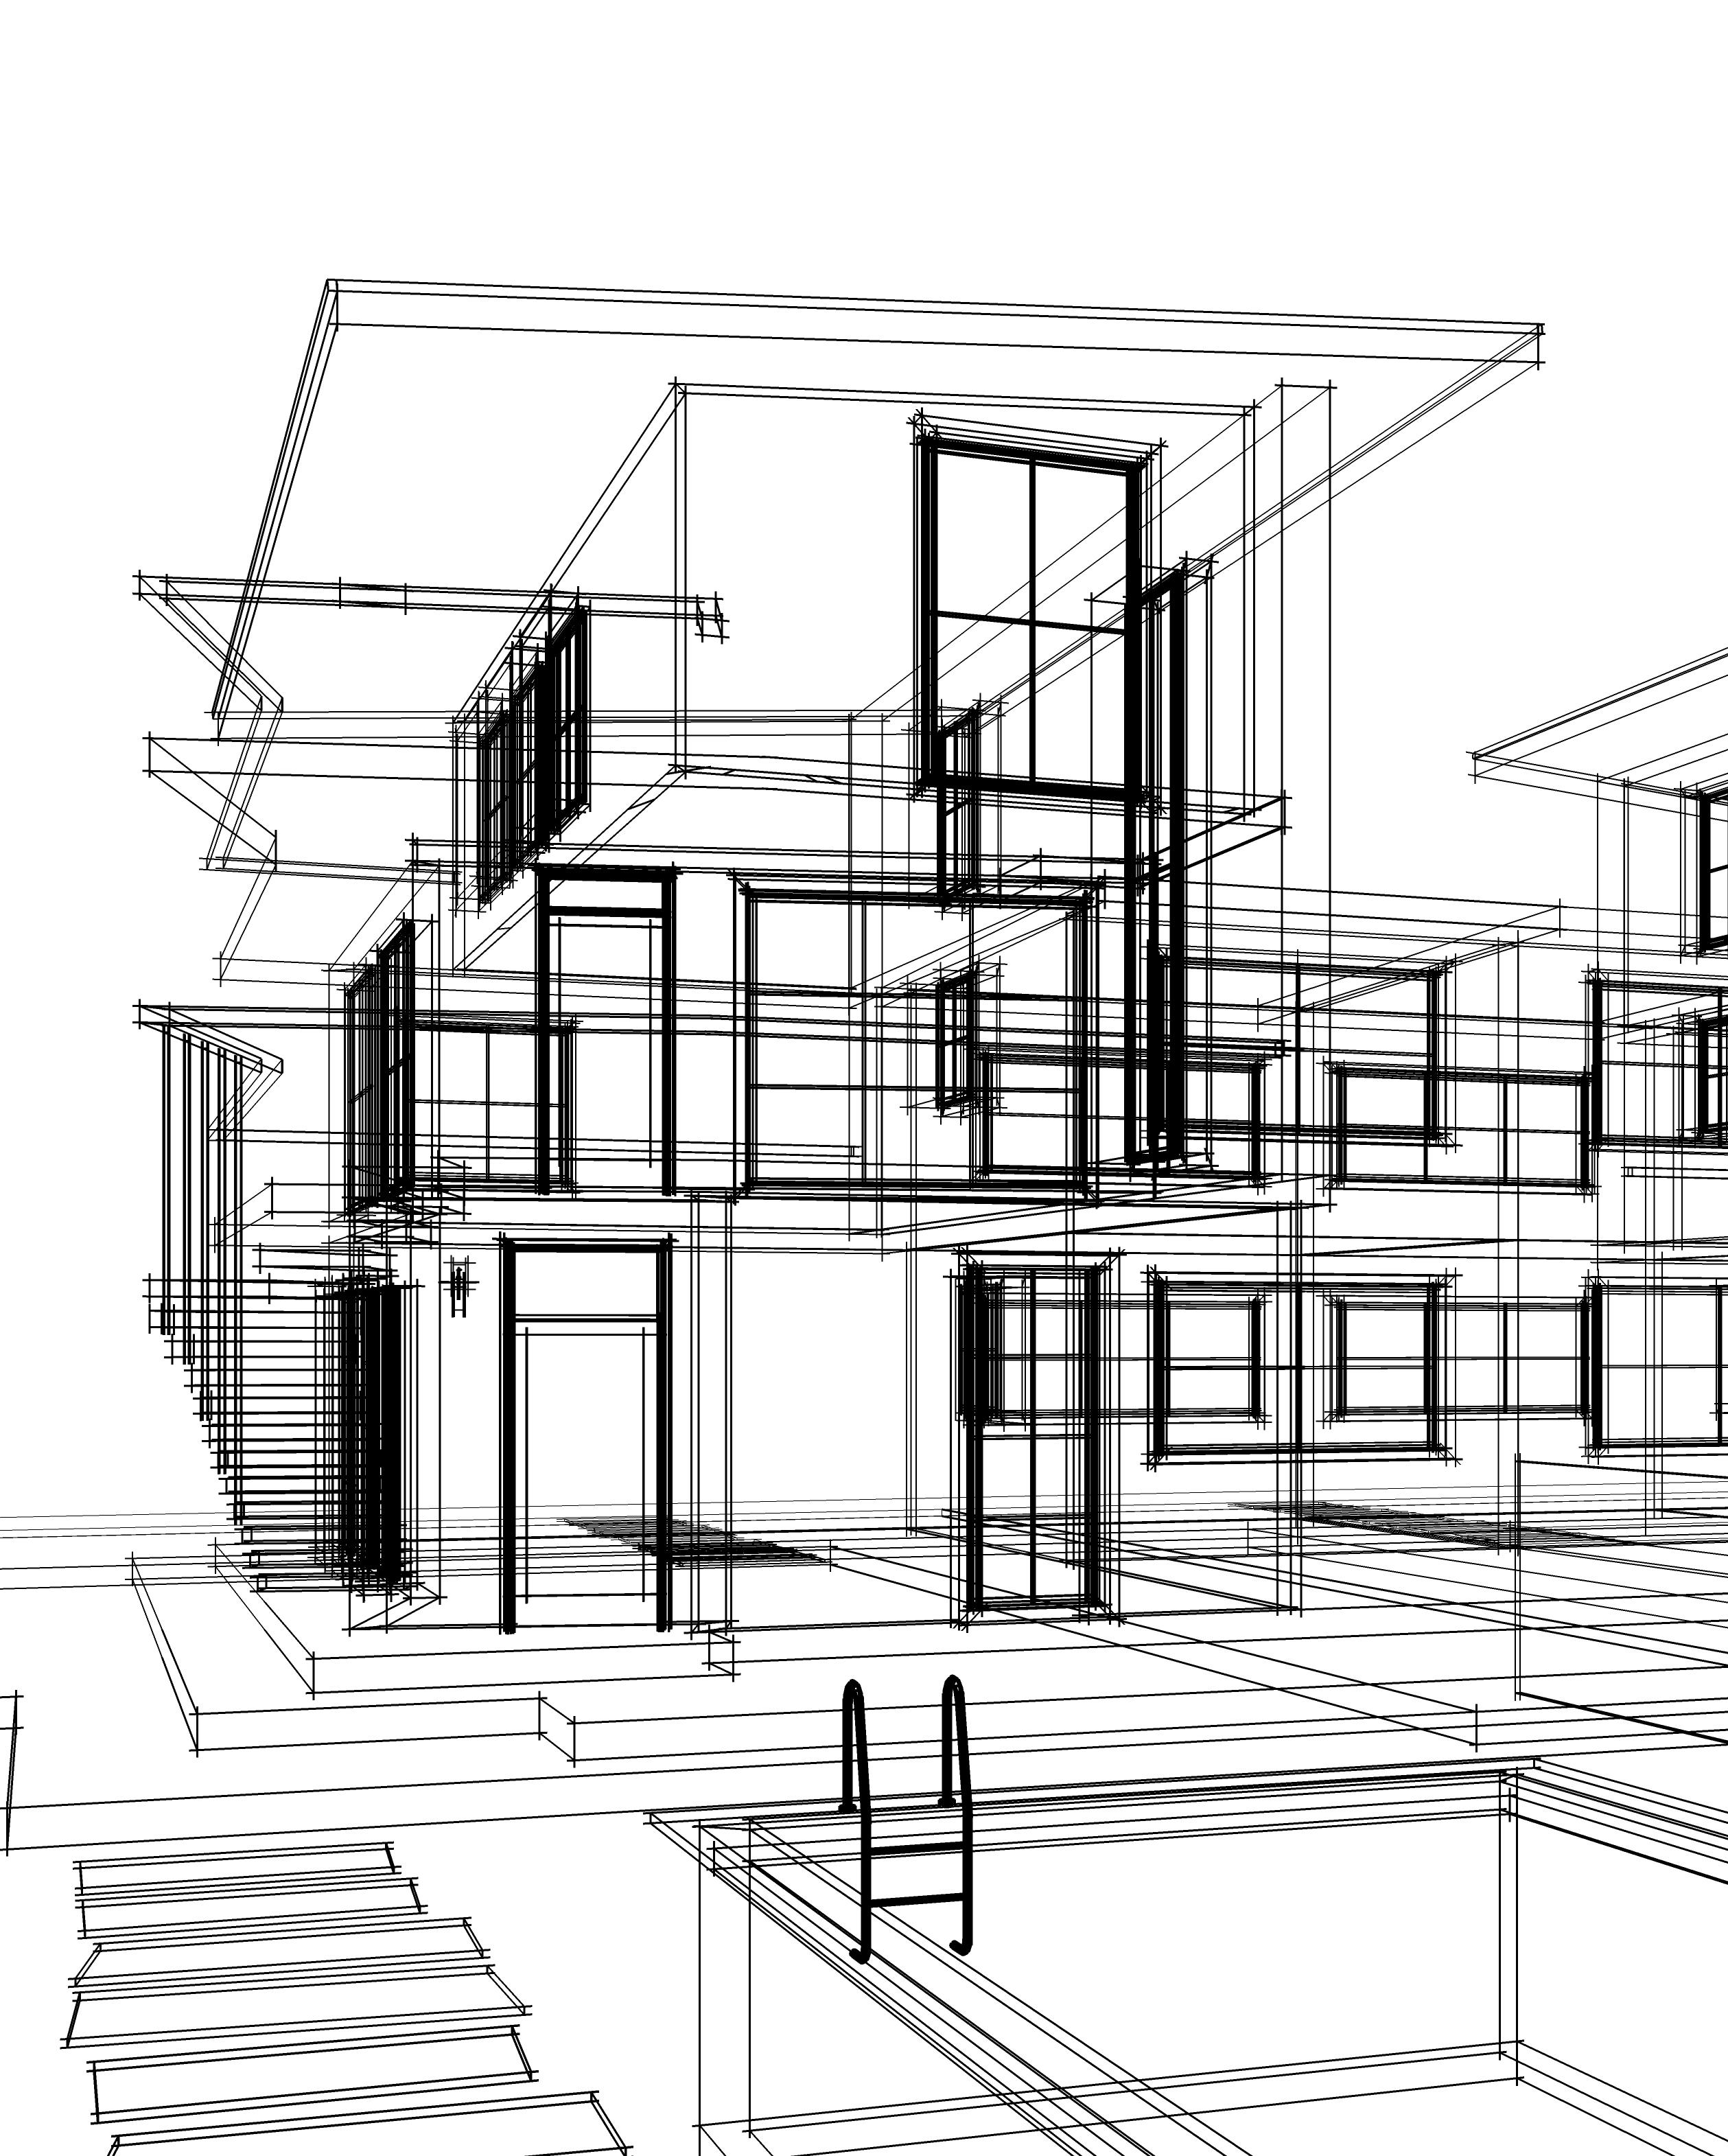 Design-Build Process